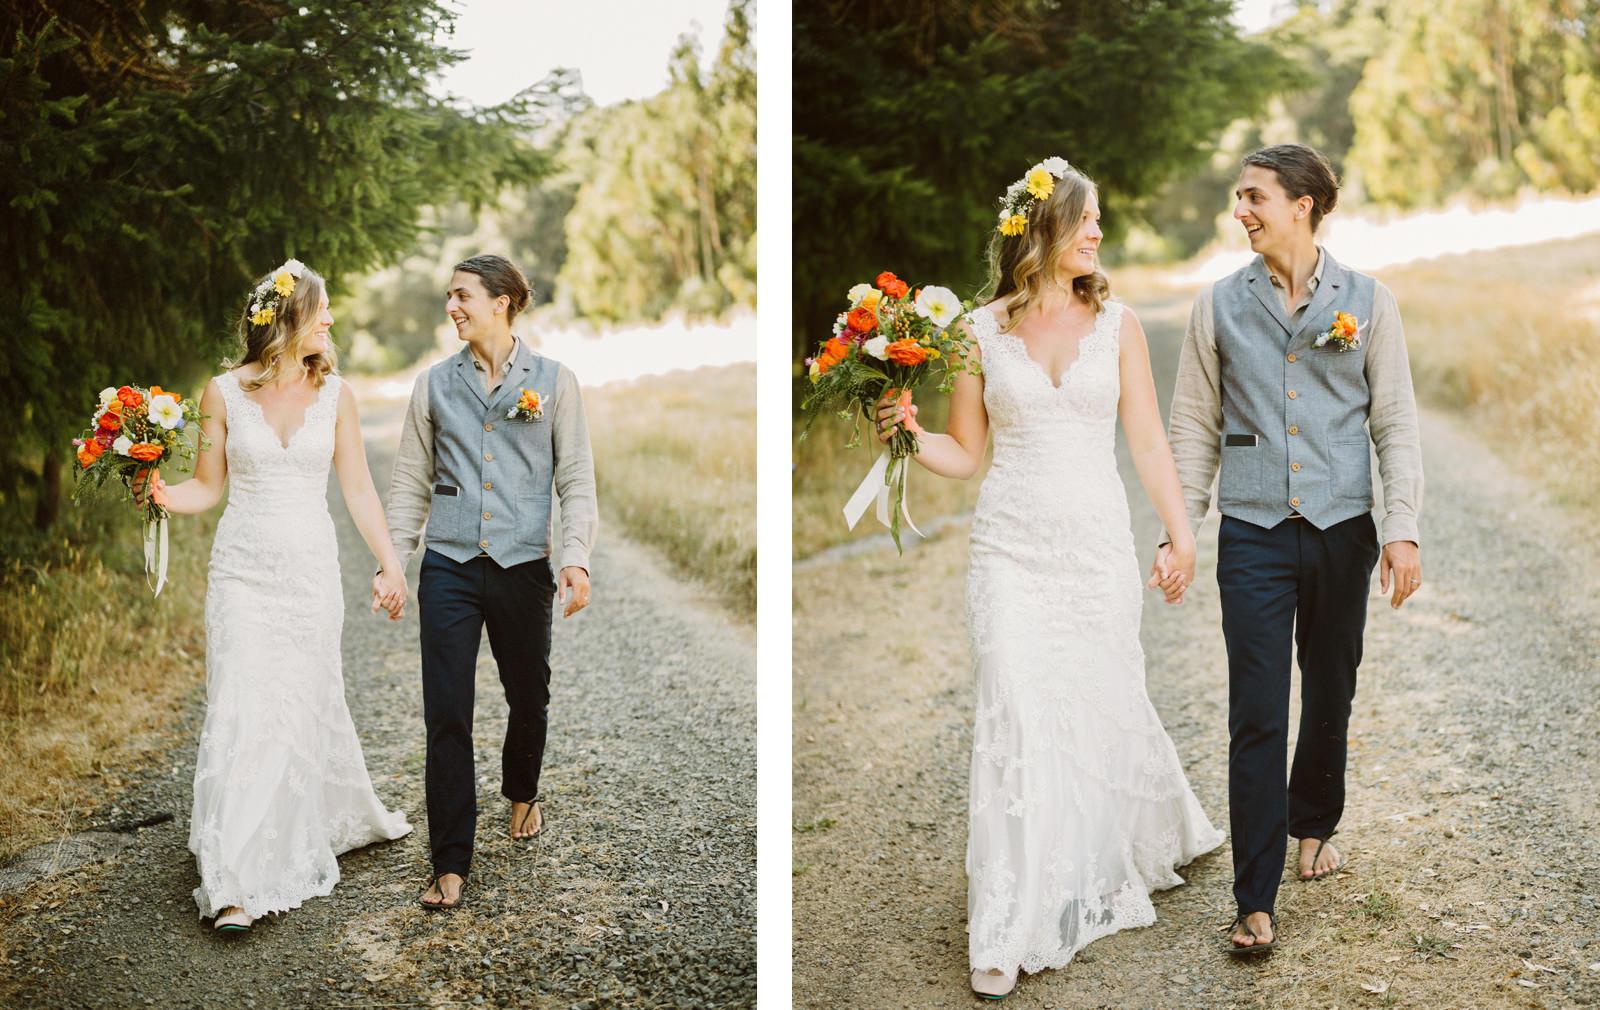 rivers-bend-retreat-wedding-045 RIVER'S BEND RETREAT WEDDING